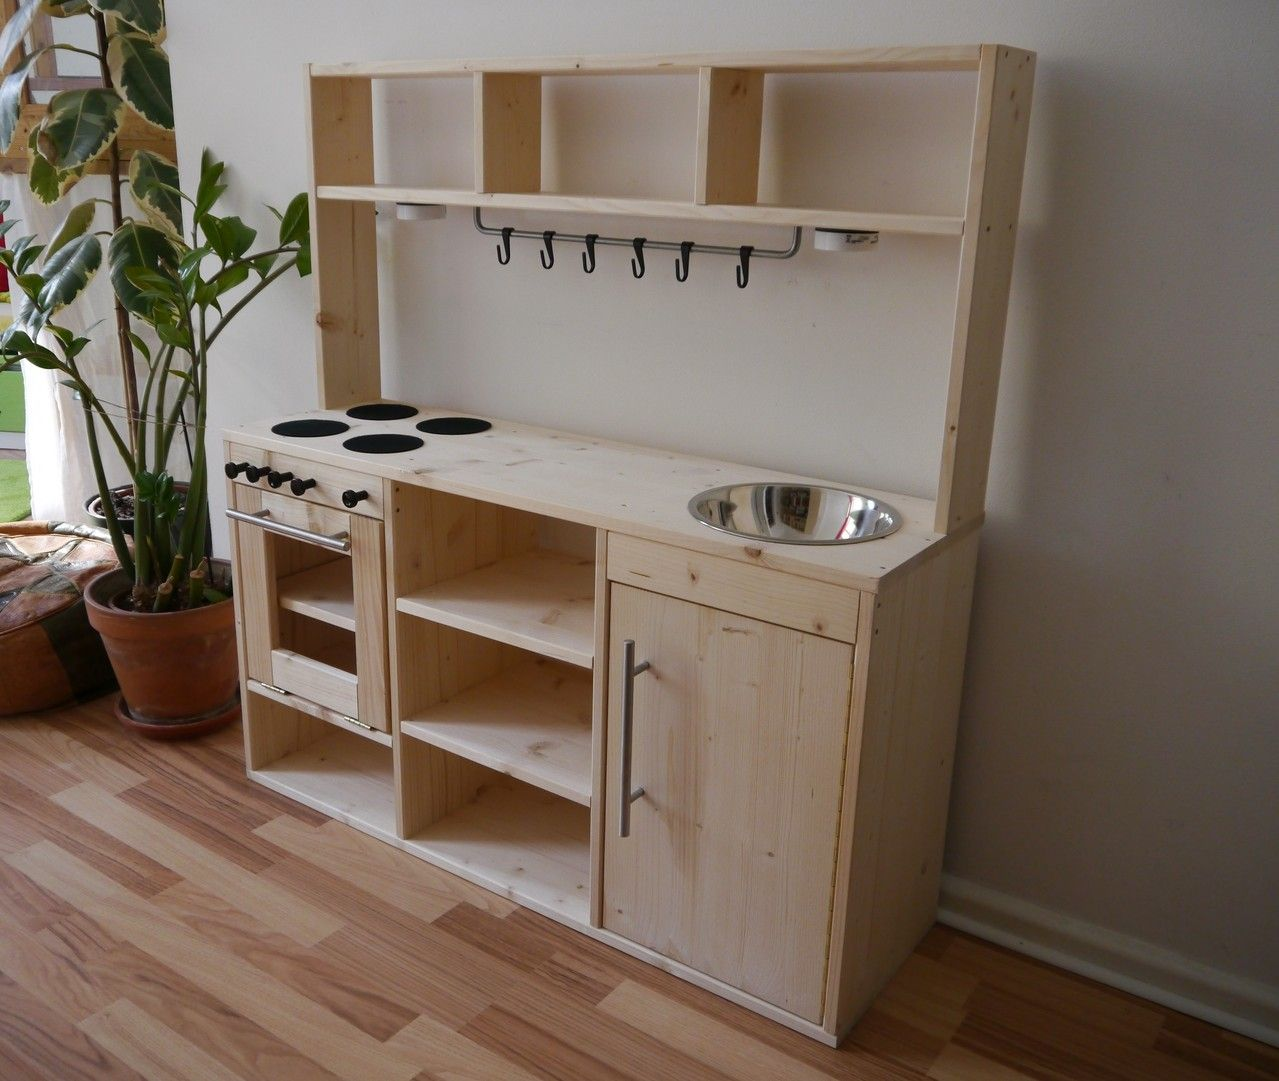 diy kinderk che zuk nftige projekte kinderk che k che. Black Bedroom Furniture Sets. Home Design Ideas